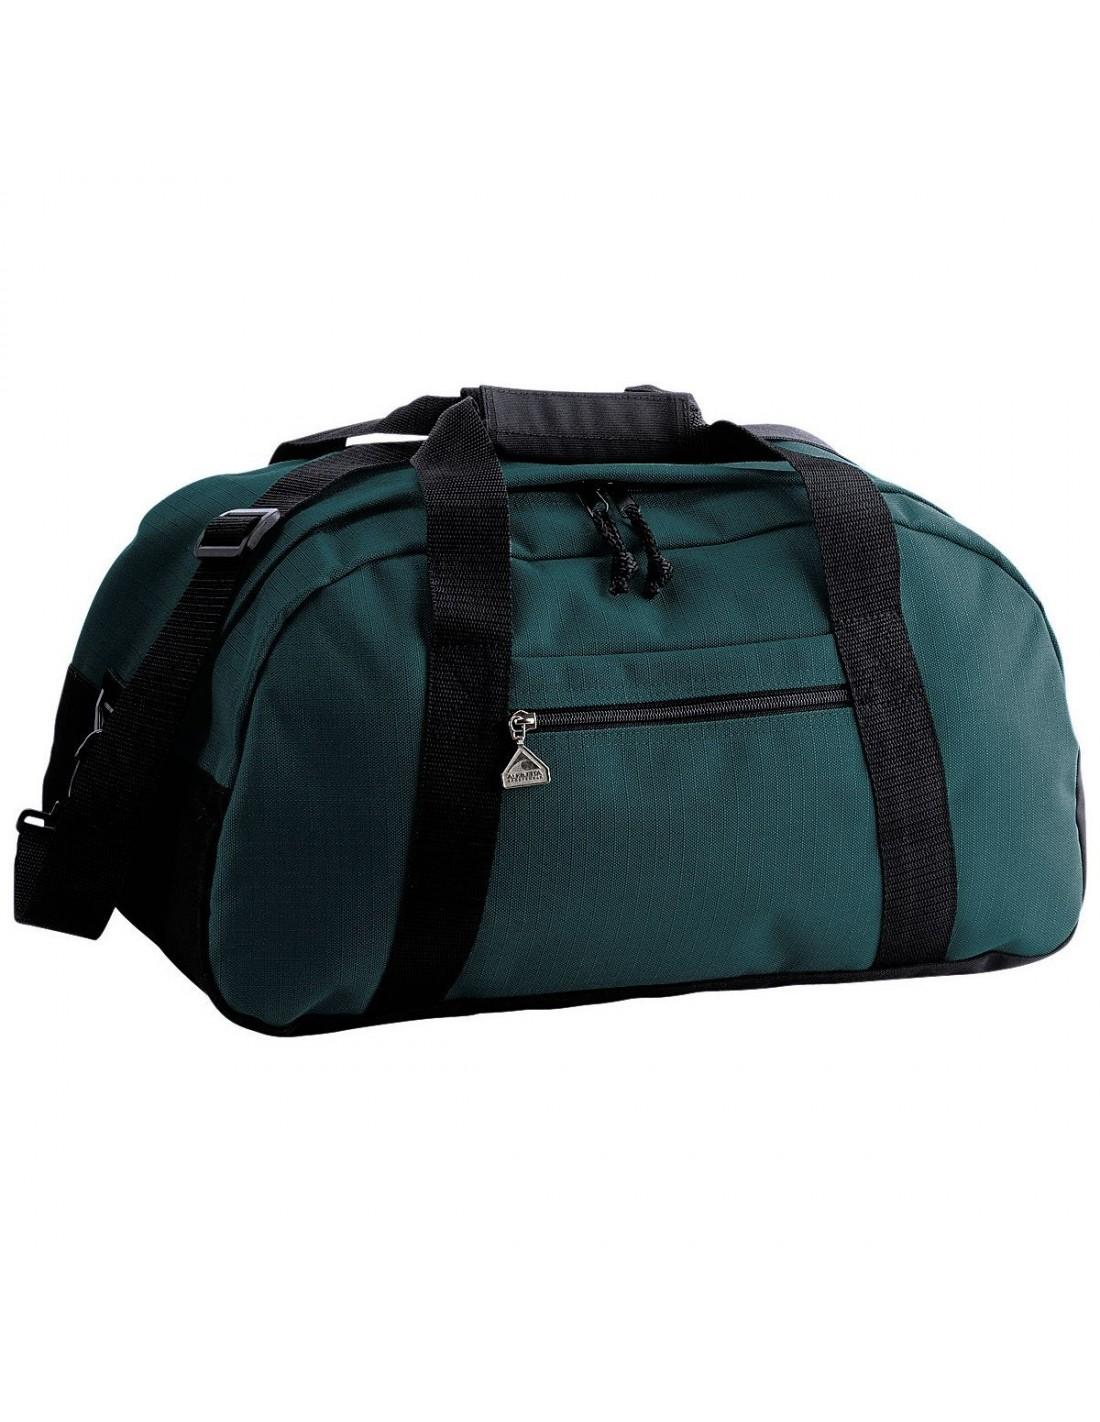 a7804415e92f Large Ripstop Duffel Bag